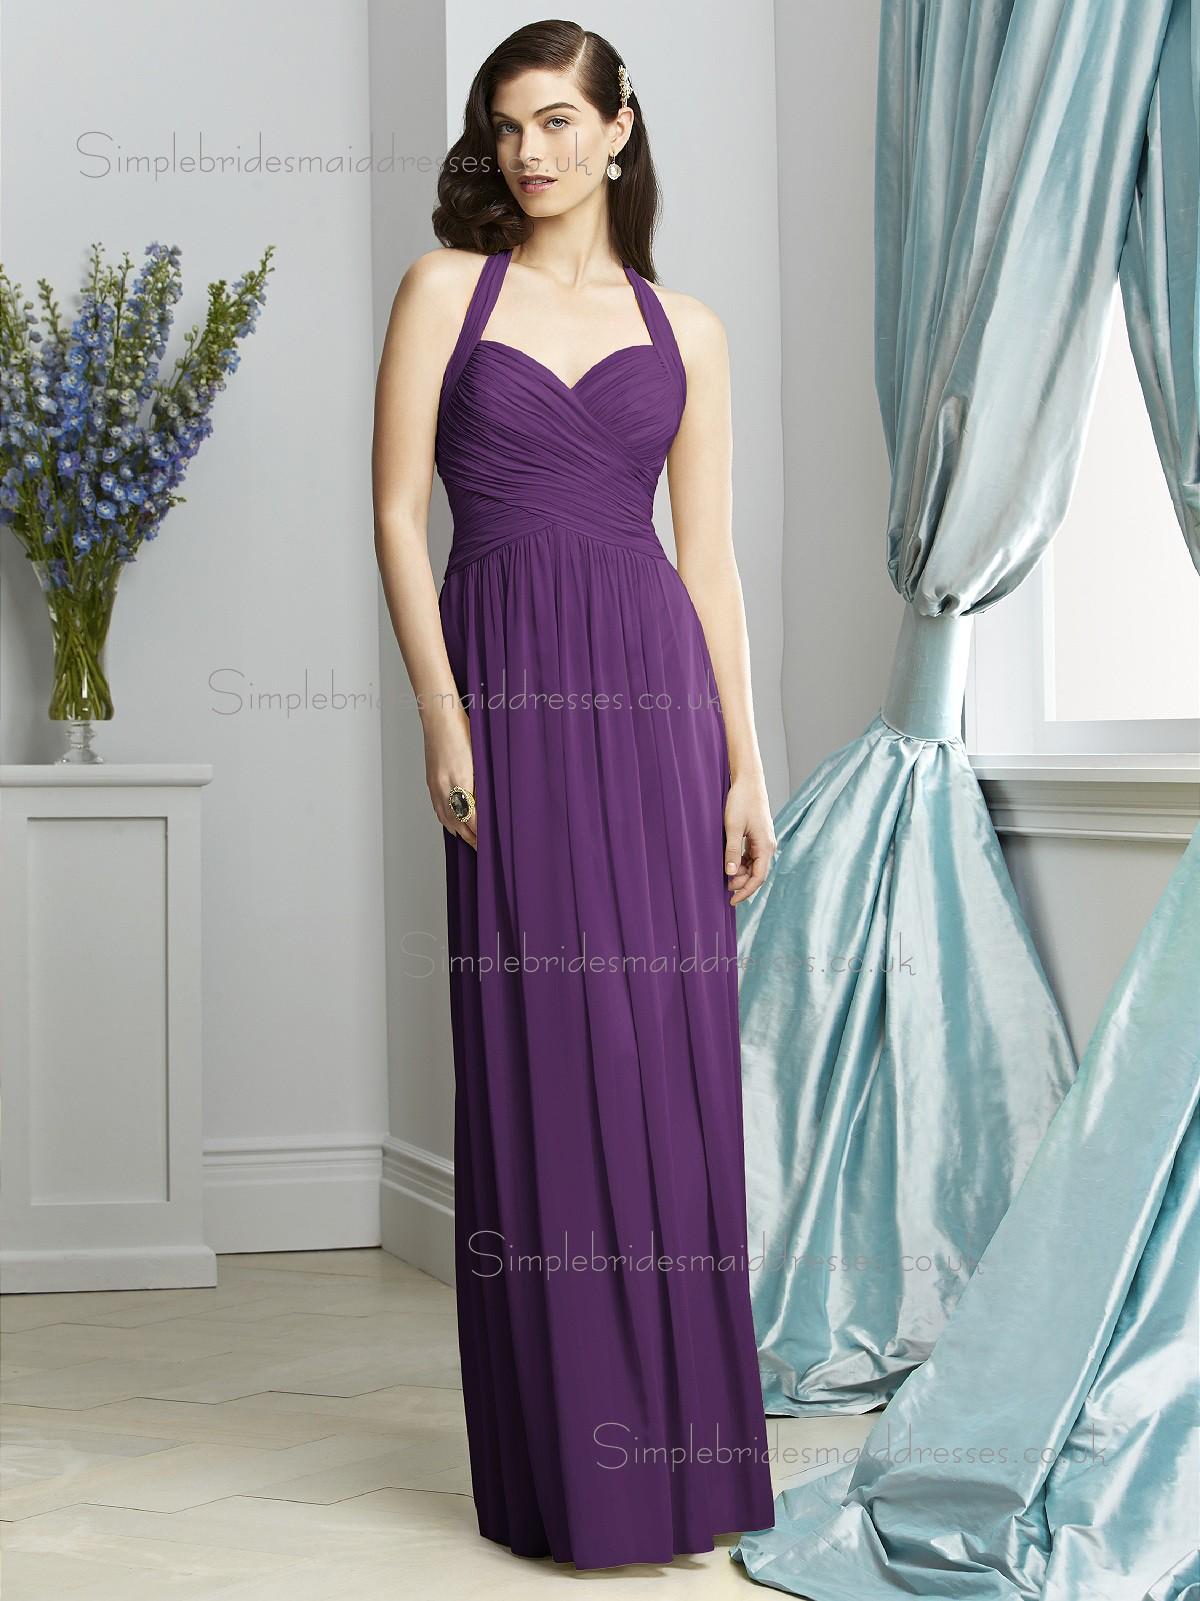 African Violet Bridesmaid Dresses Uk - Wedding Guest Dresses